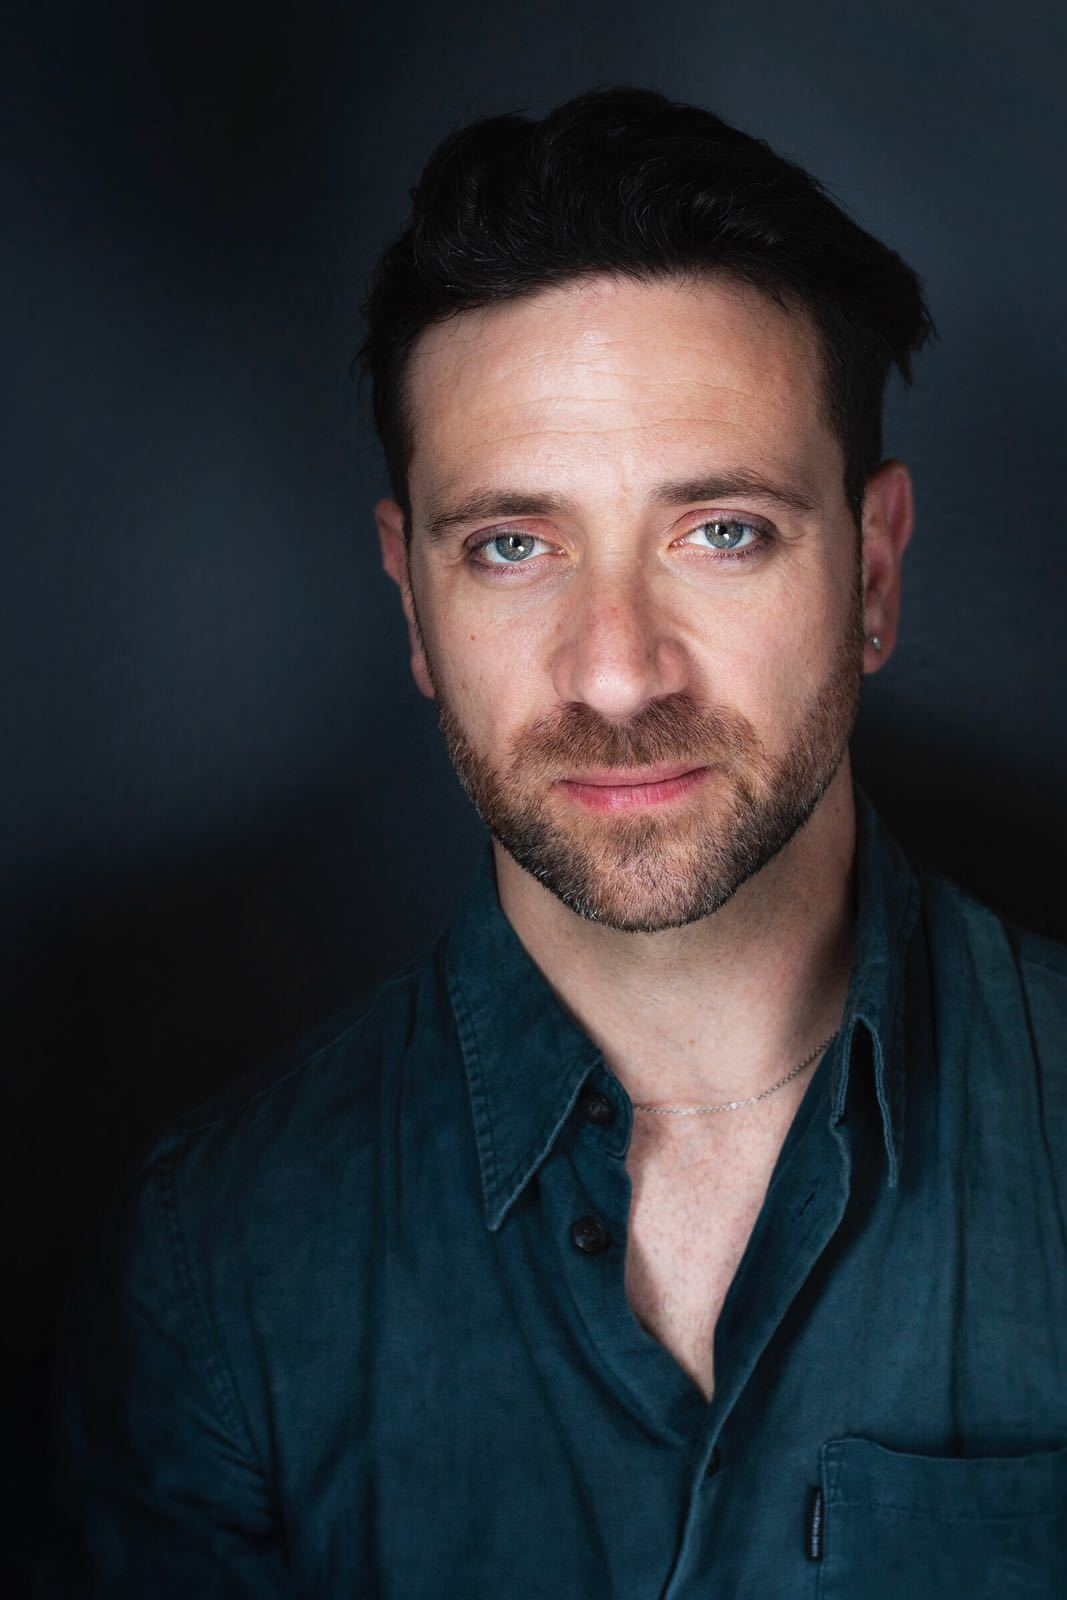 BWW Interview: Giovanni Lipari Talks Designing for AMC's INTO THE BADLANDS